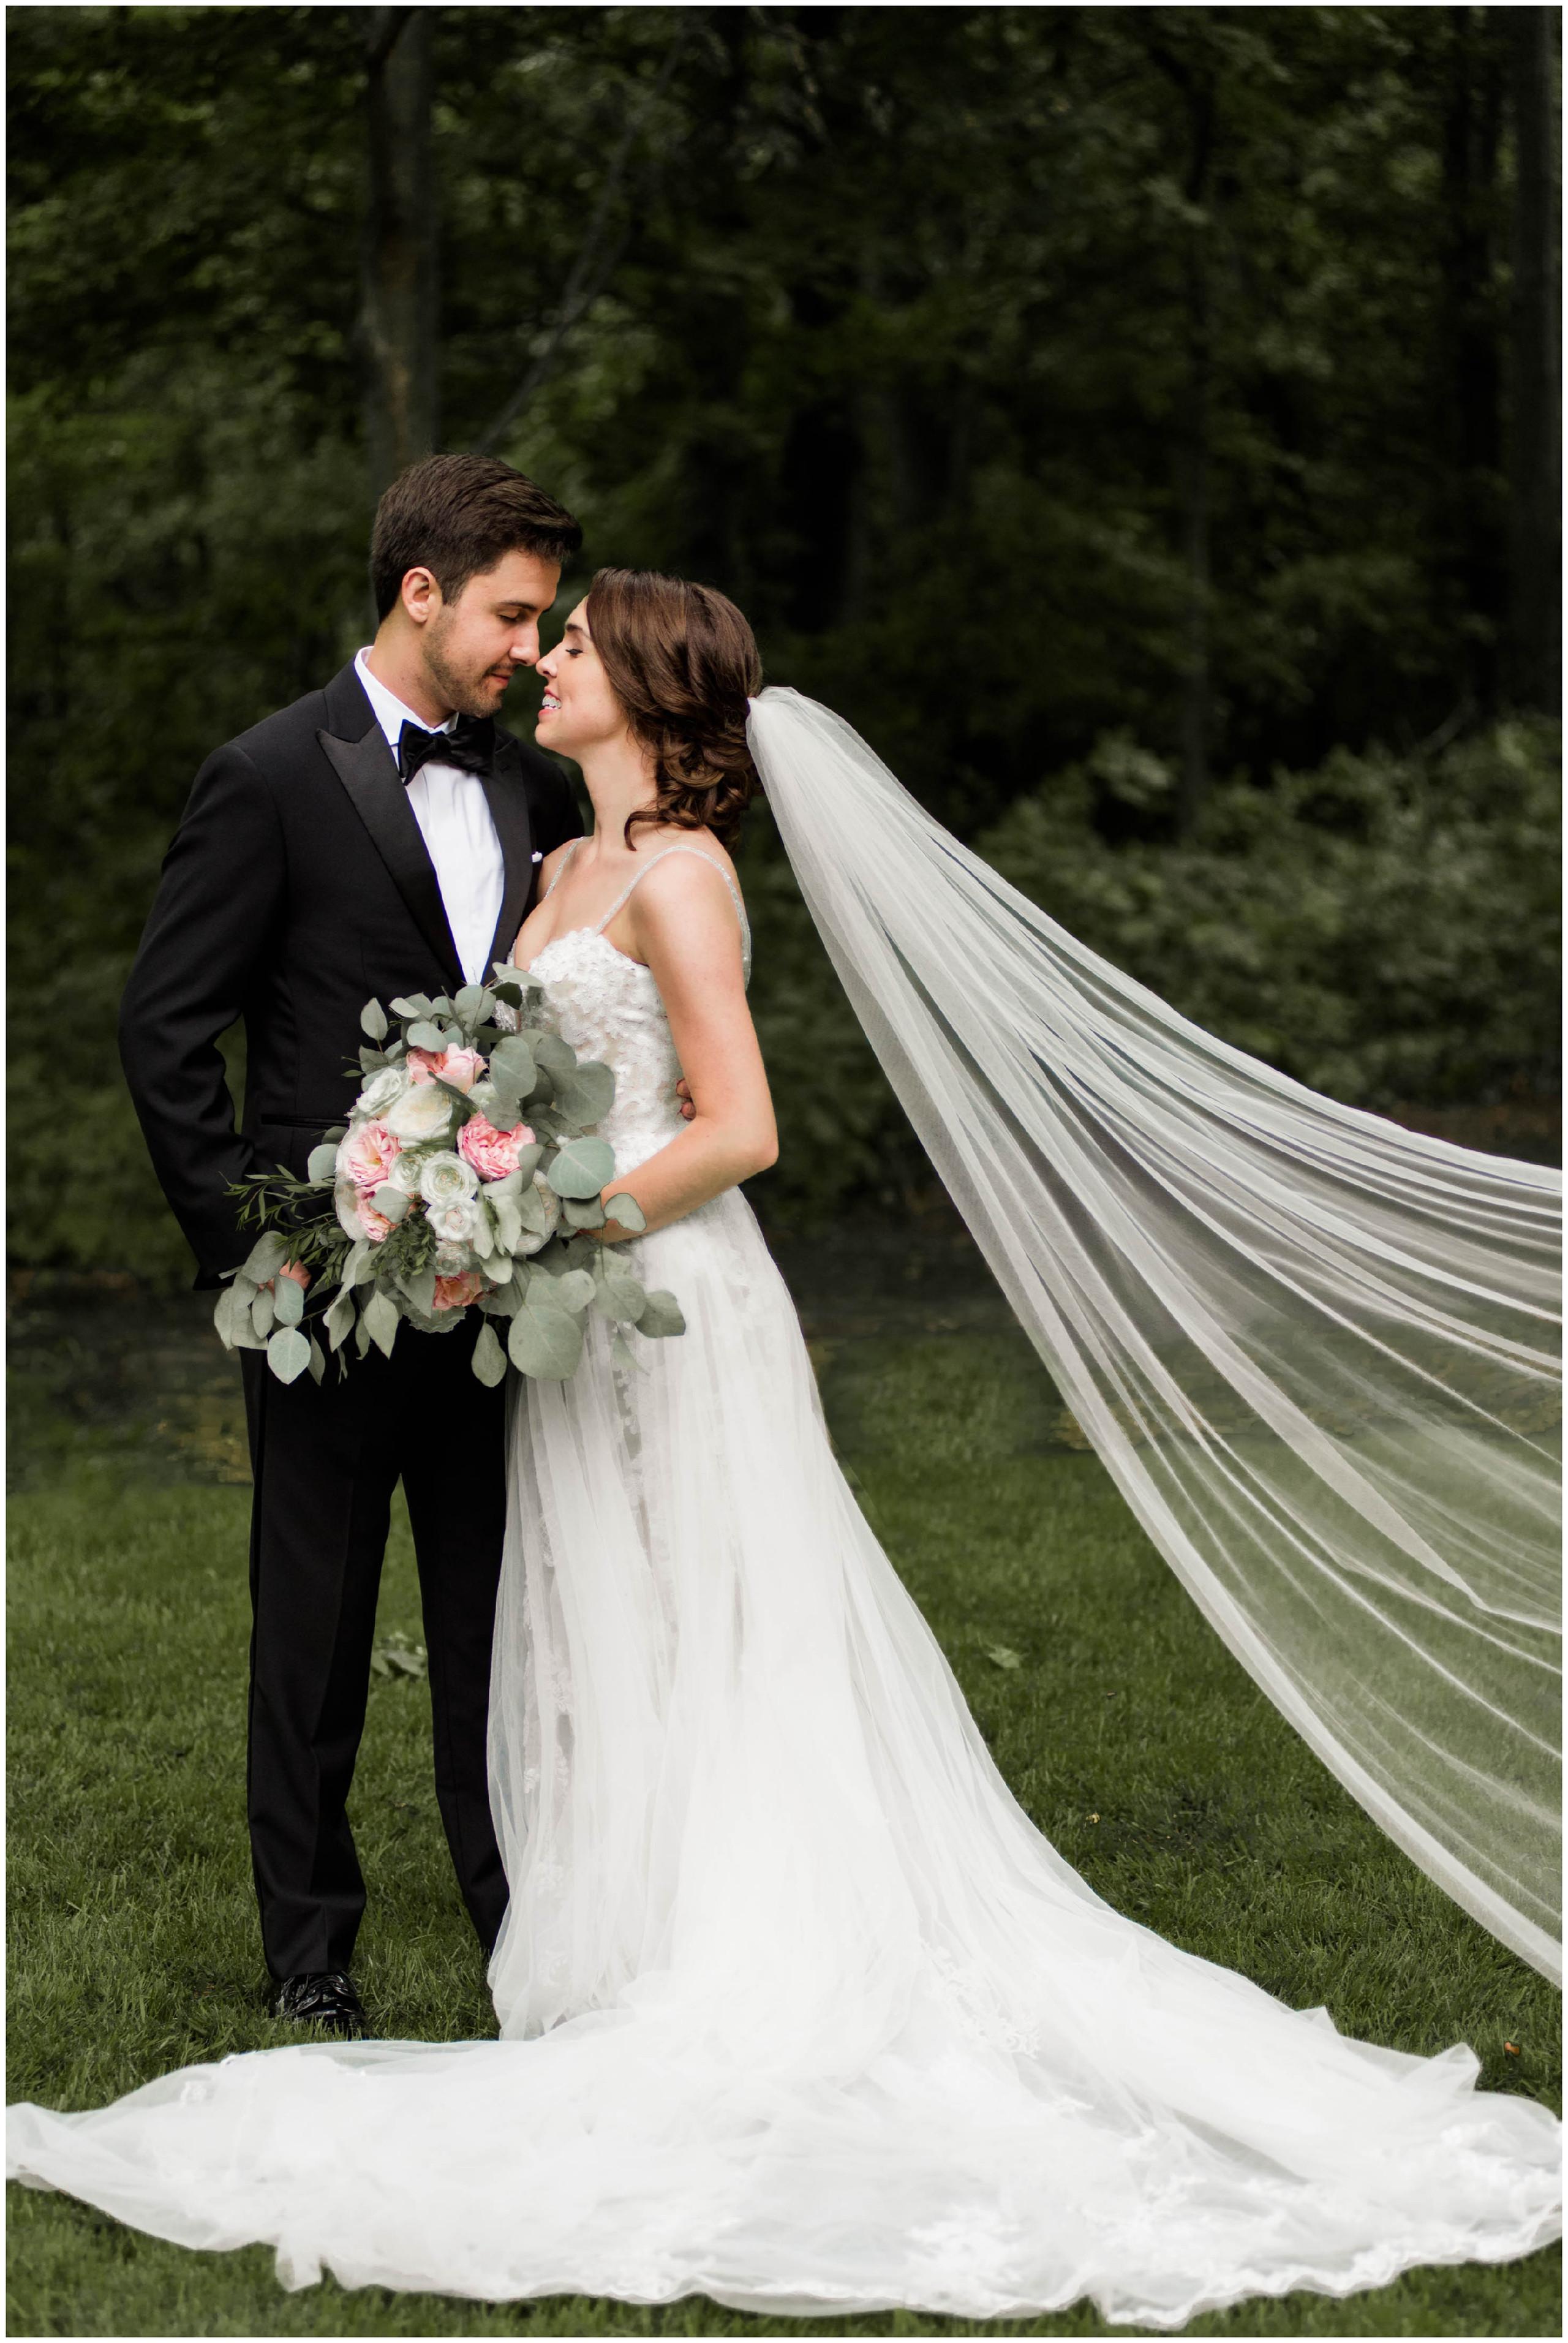 the-wooded-knot-weddings-Tippecanoe, IN